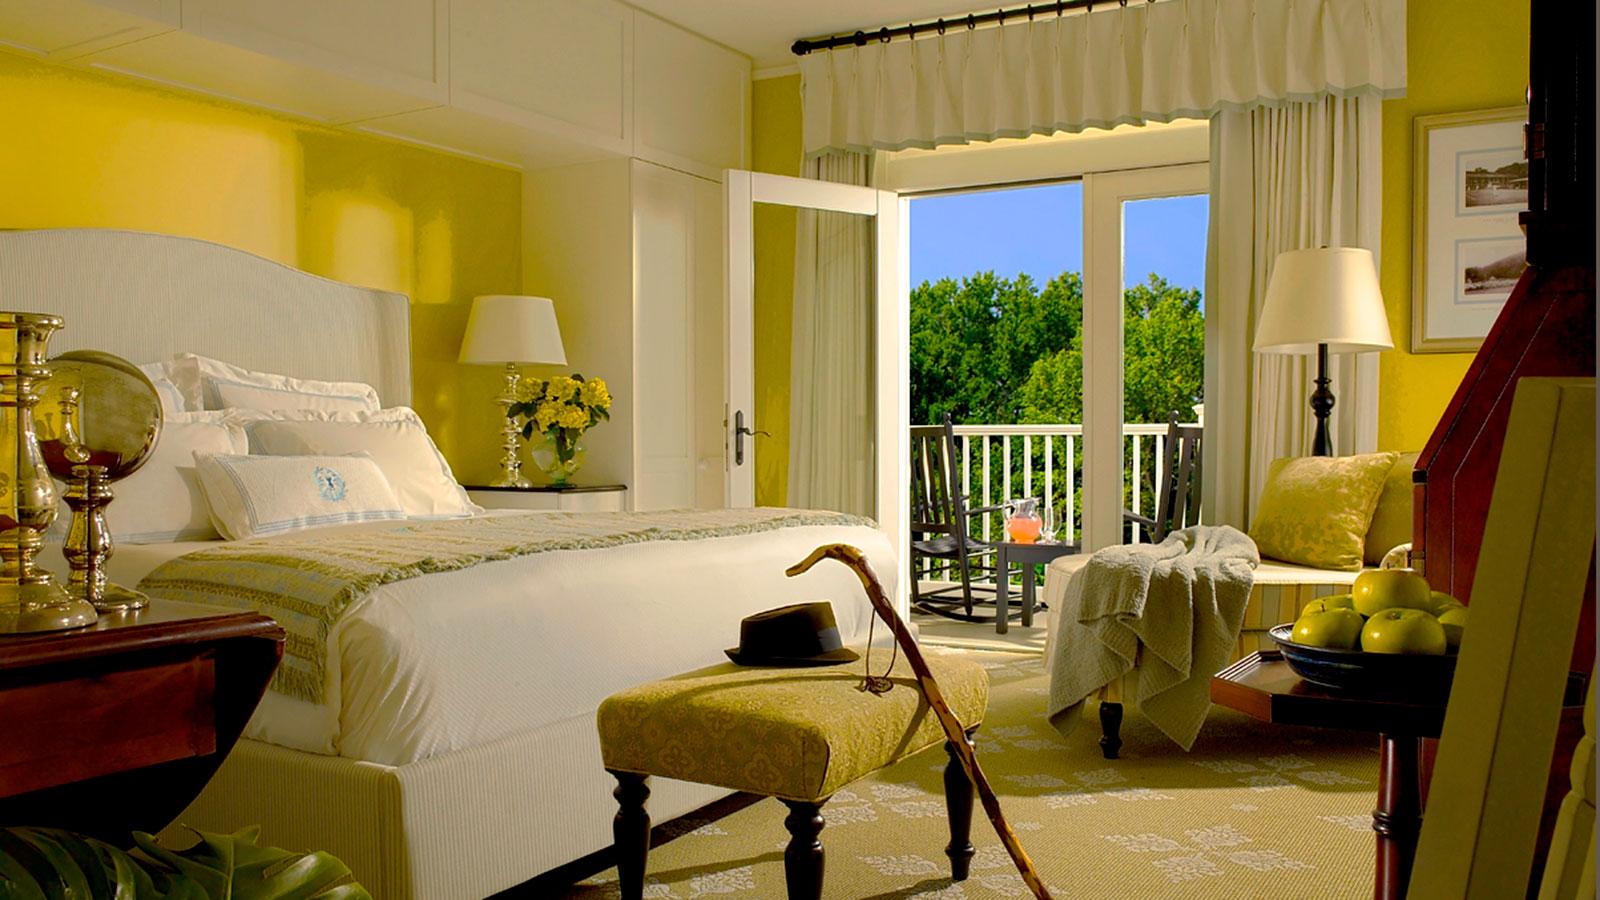 Image of Guestroom Interior, Omni Bedford Springs Resort & Spa, Bedford, Pennsylvania, 1806, Member of Historic Hotels of America, Accommodations